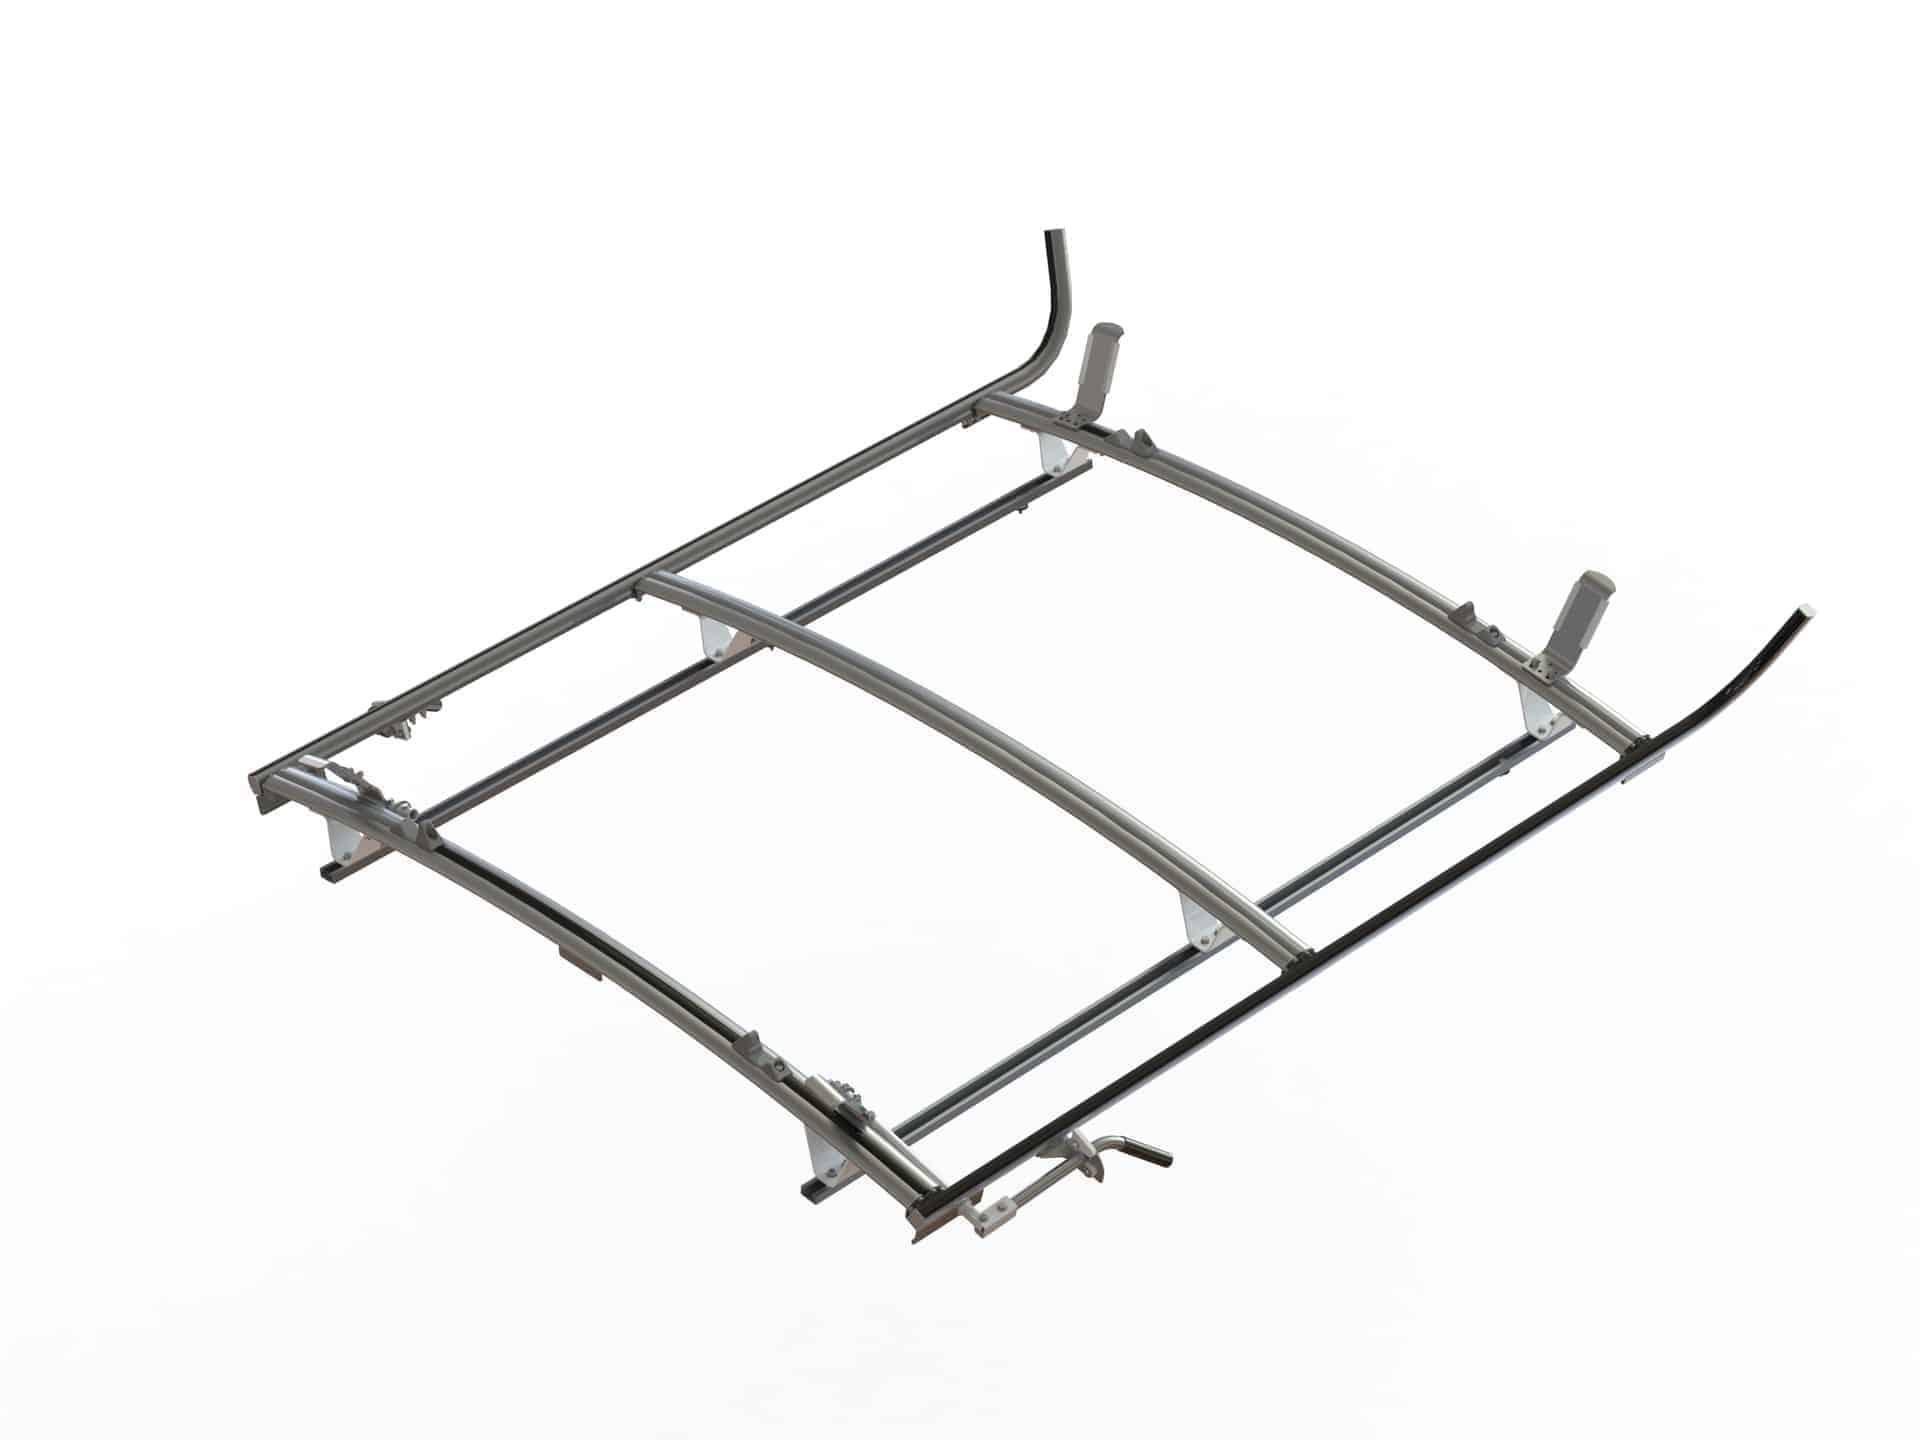 Double Side Ladder Rack For Ford Transit Rwb